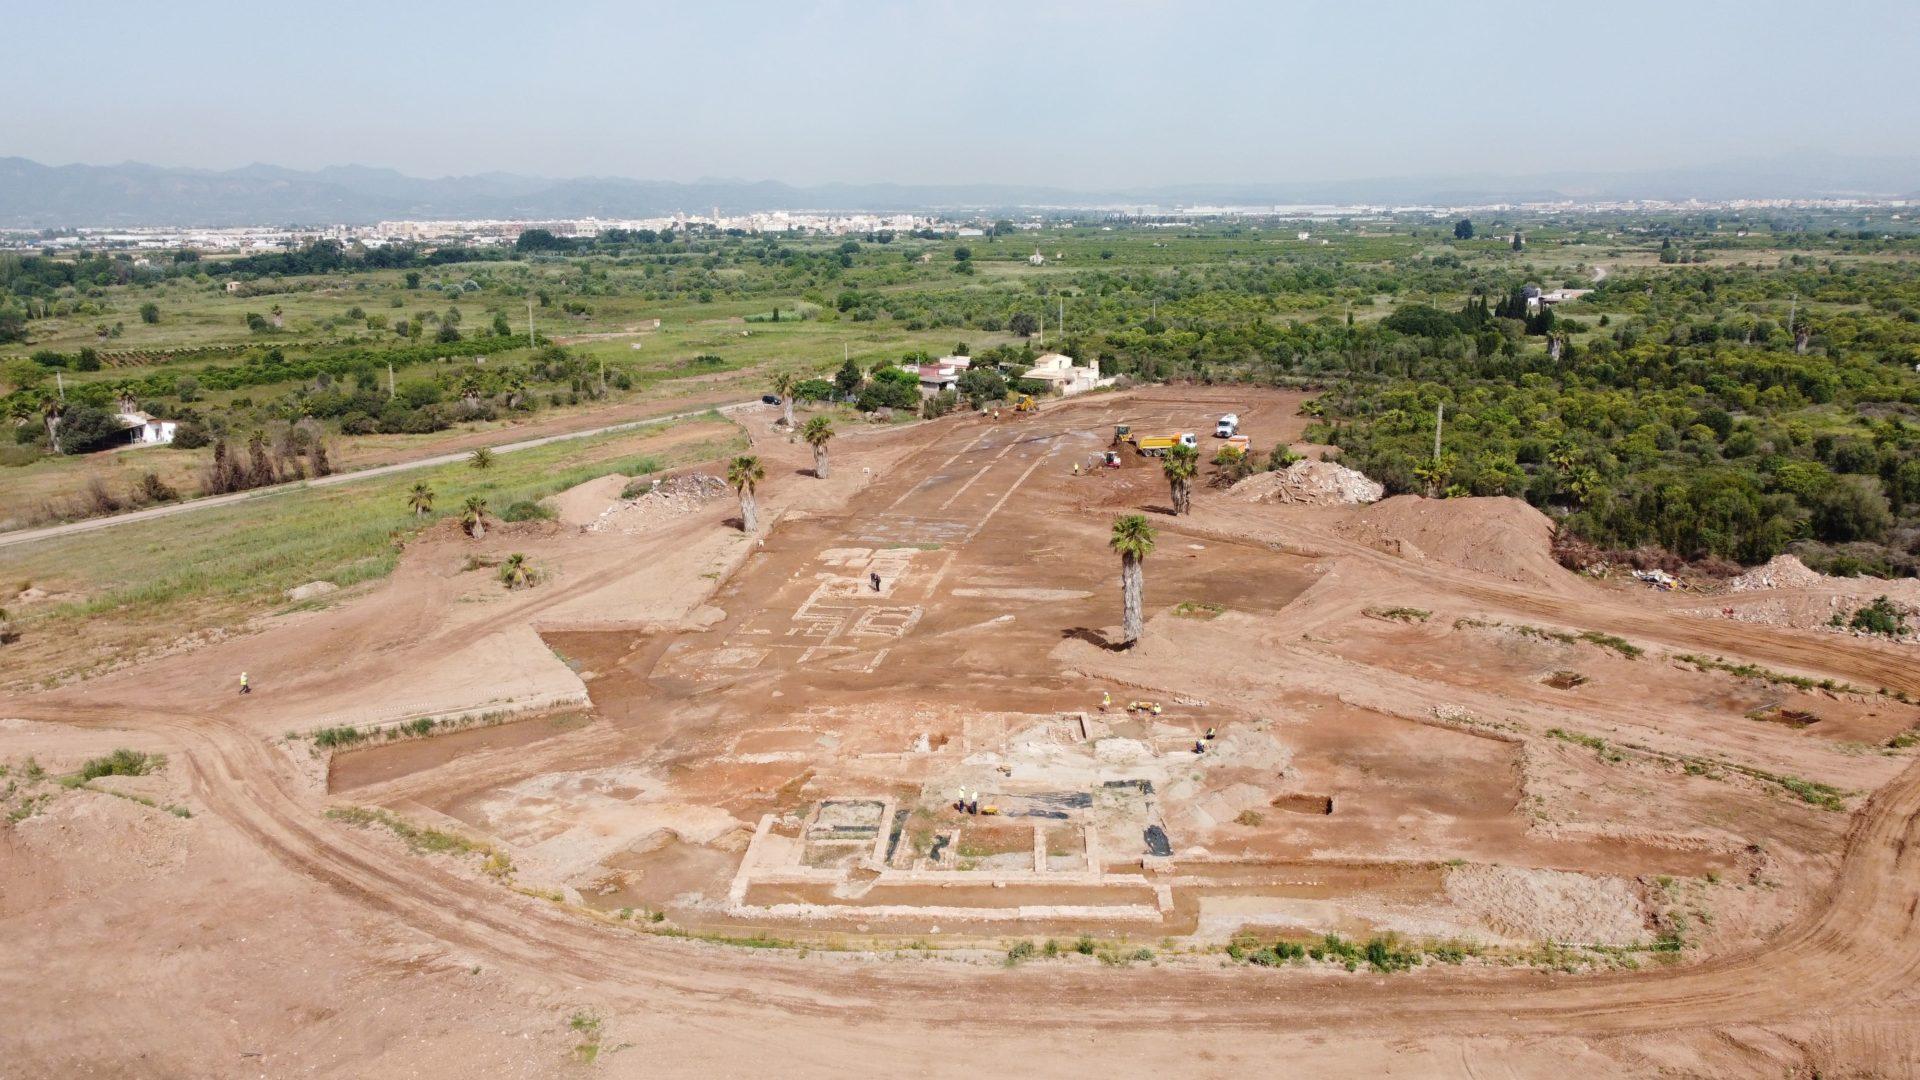 yacimiento arqueológico de la villa romana de Sant Gregori